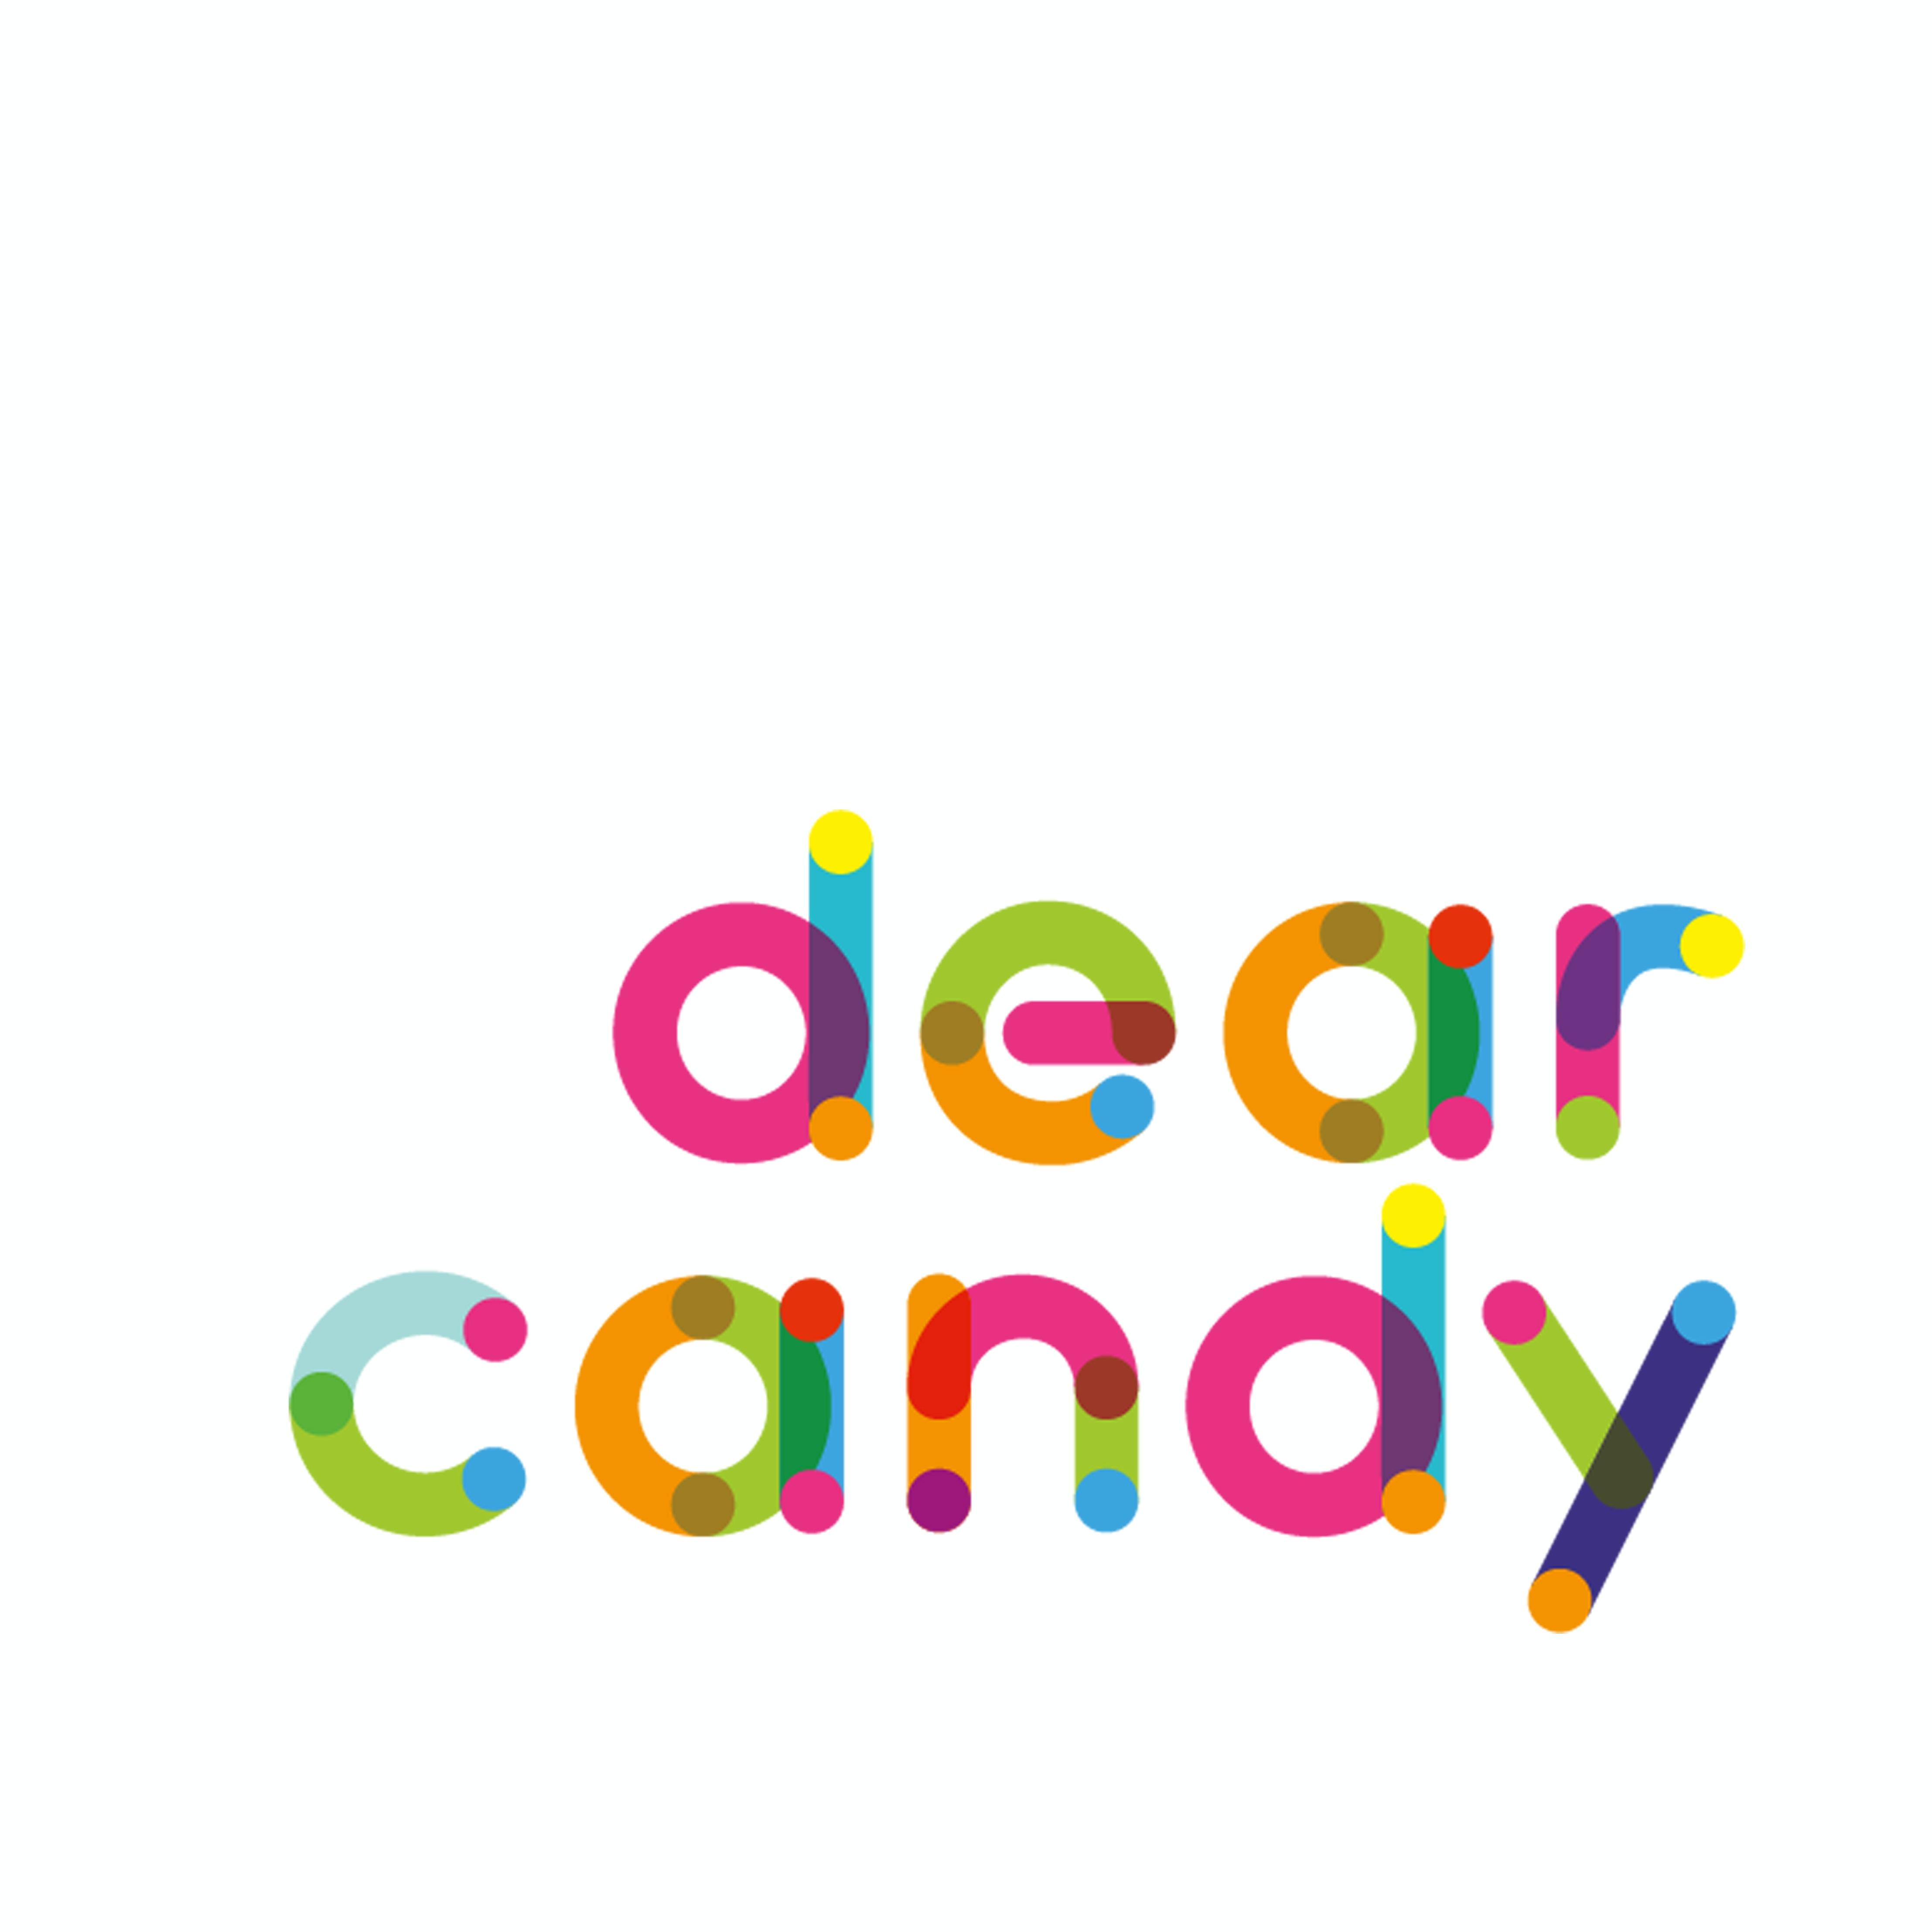 Go to candice's profile